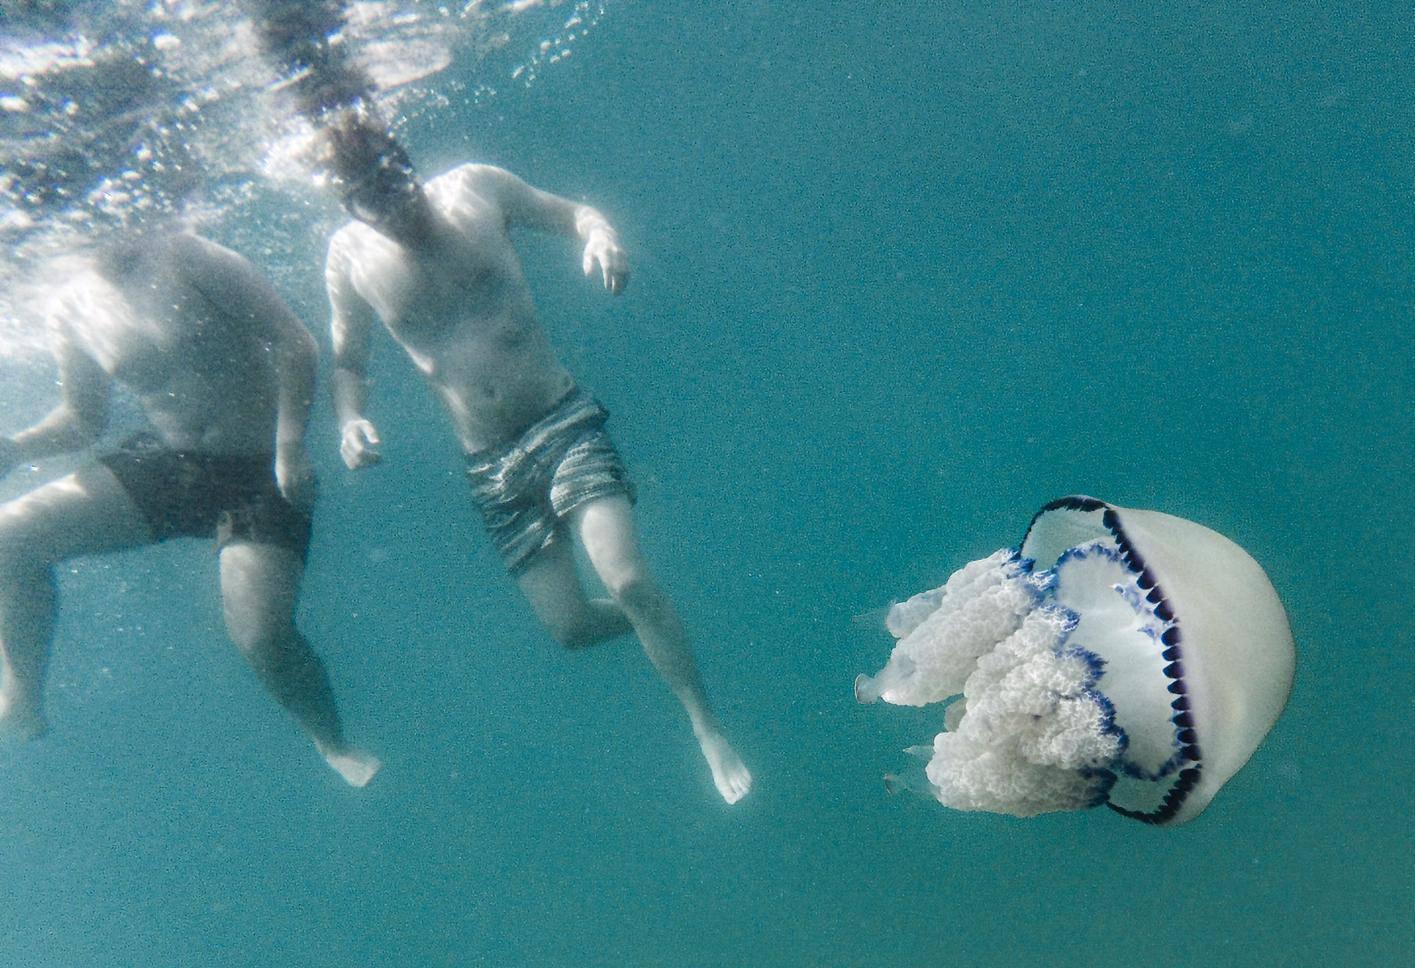 Video: Plivali smo s meduzom